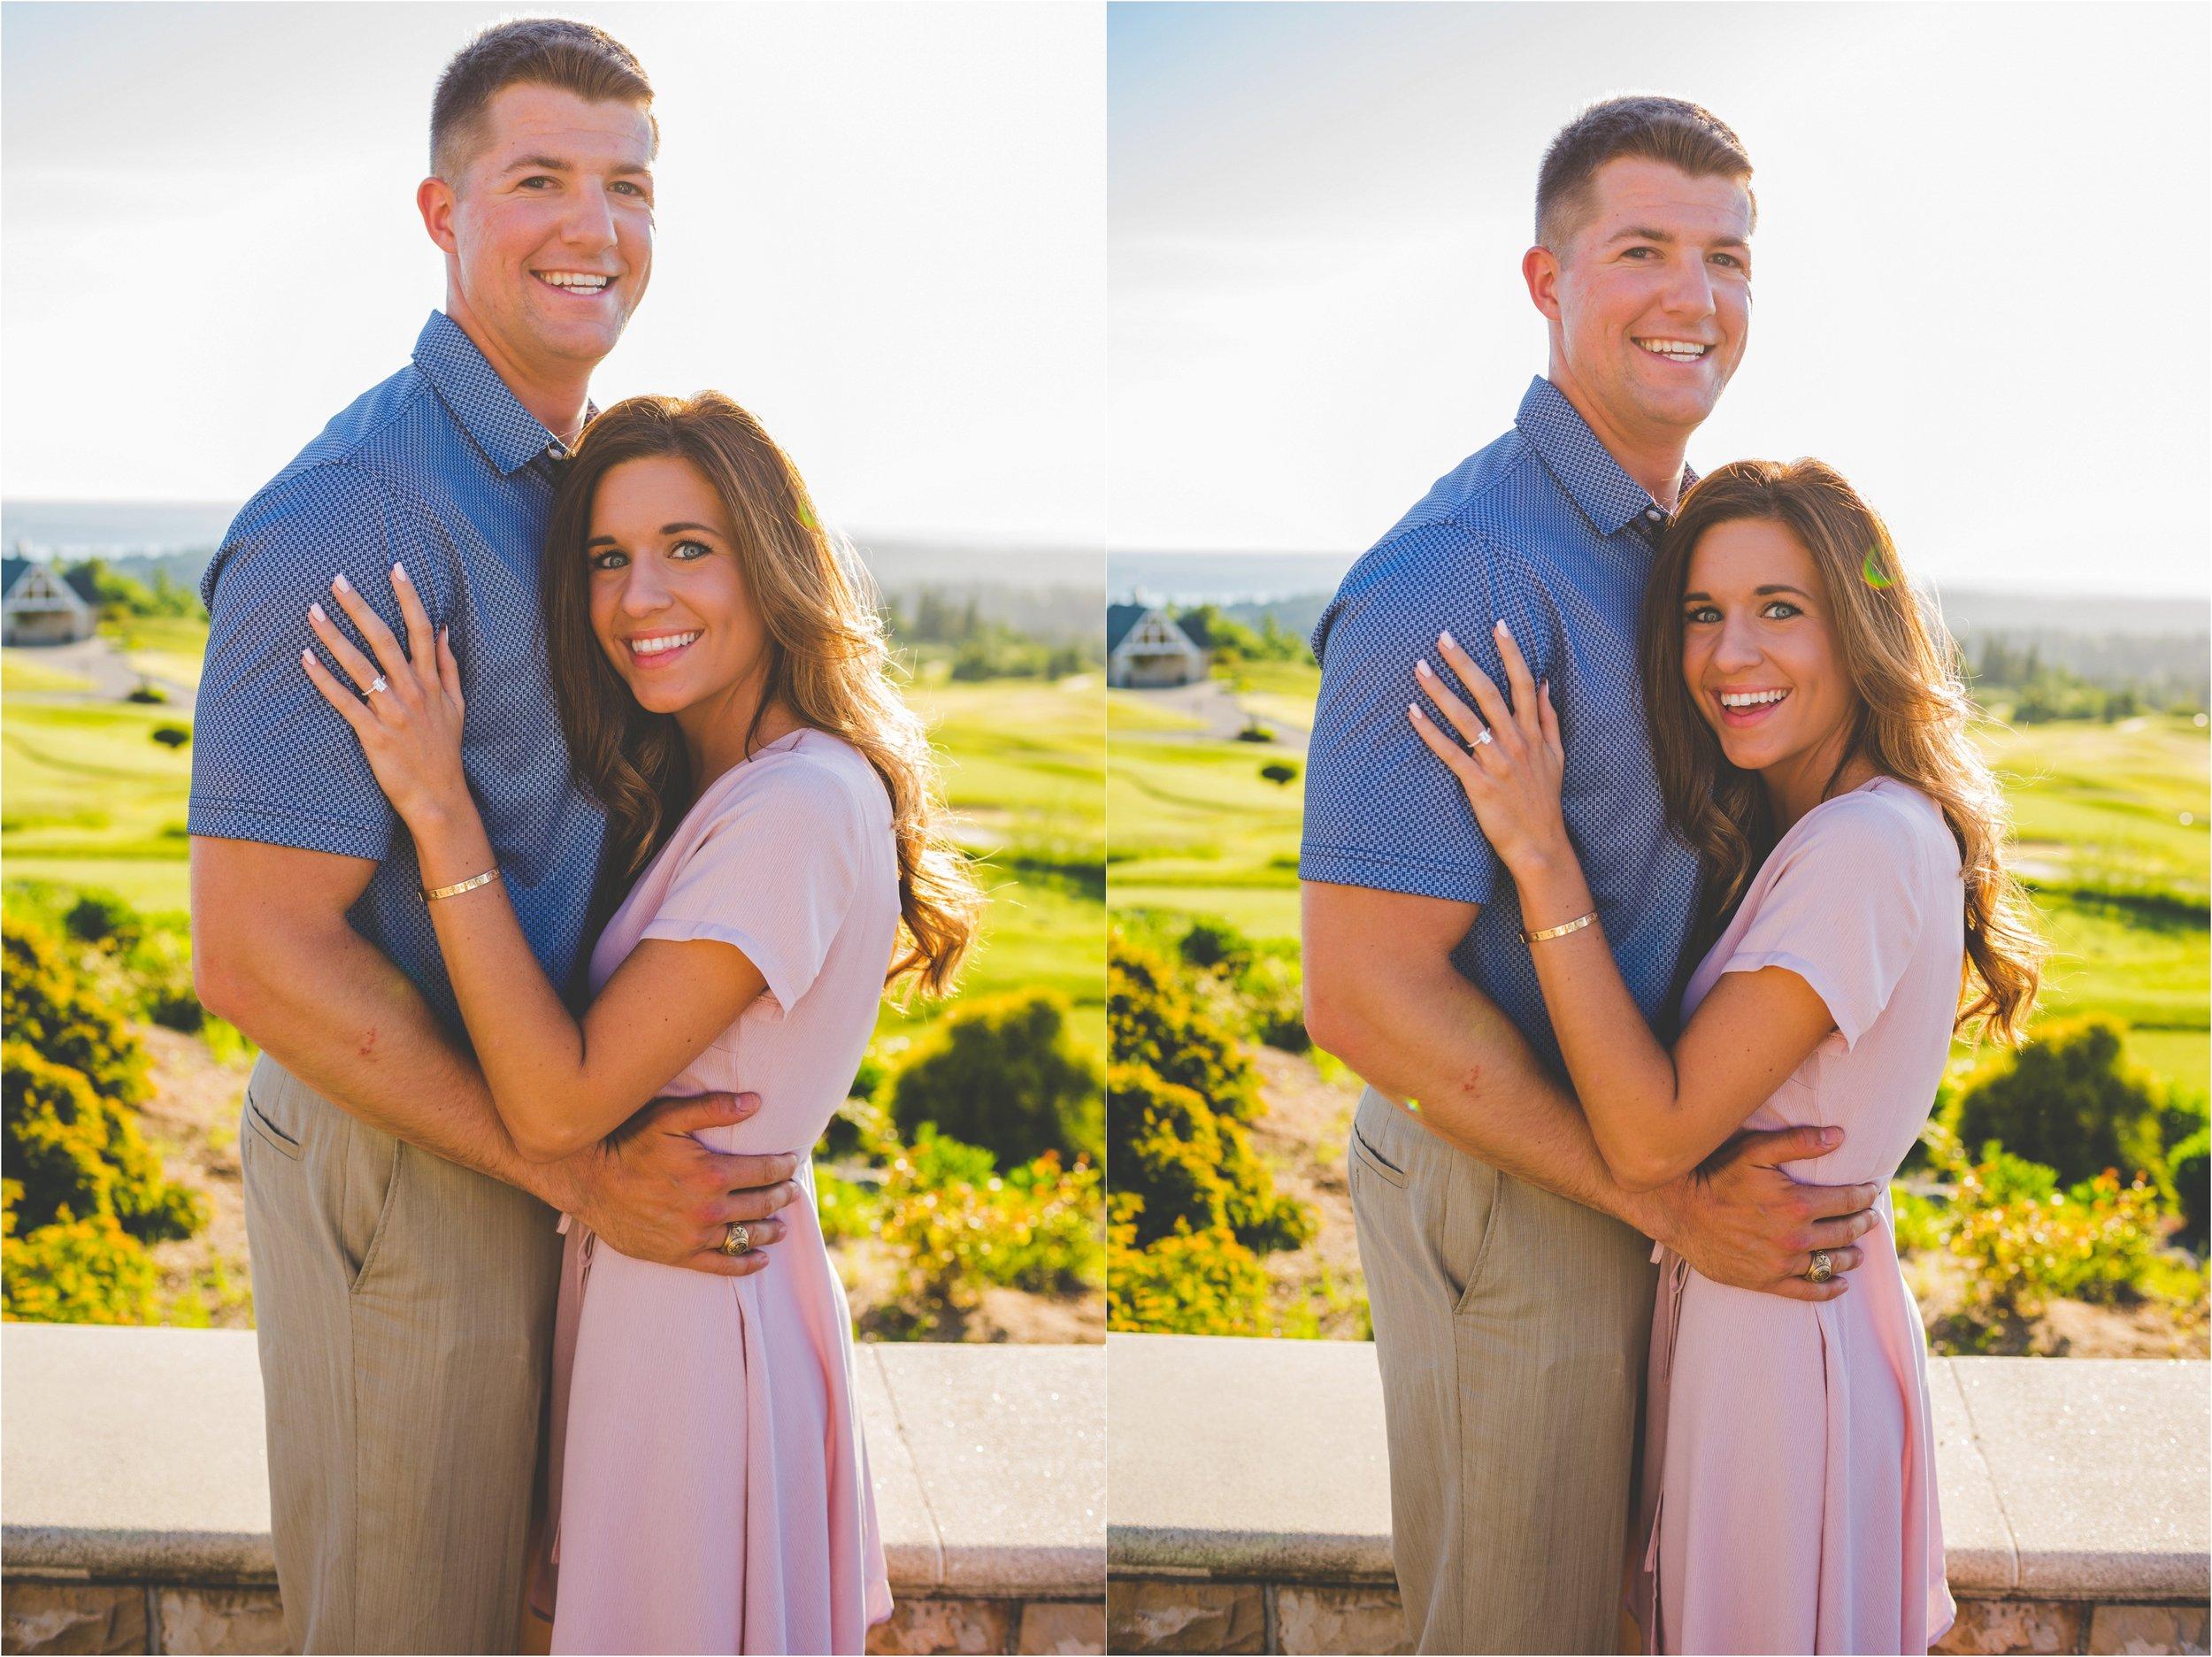 newcastle-golf-club-proposal-jannicka-mayte-seattle-washington-engagement-wedding-photographer_0033.jpg